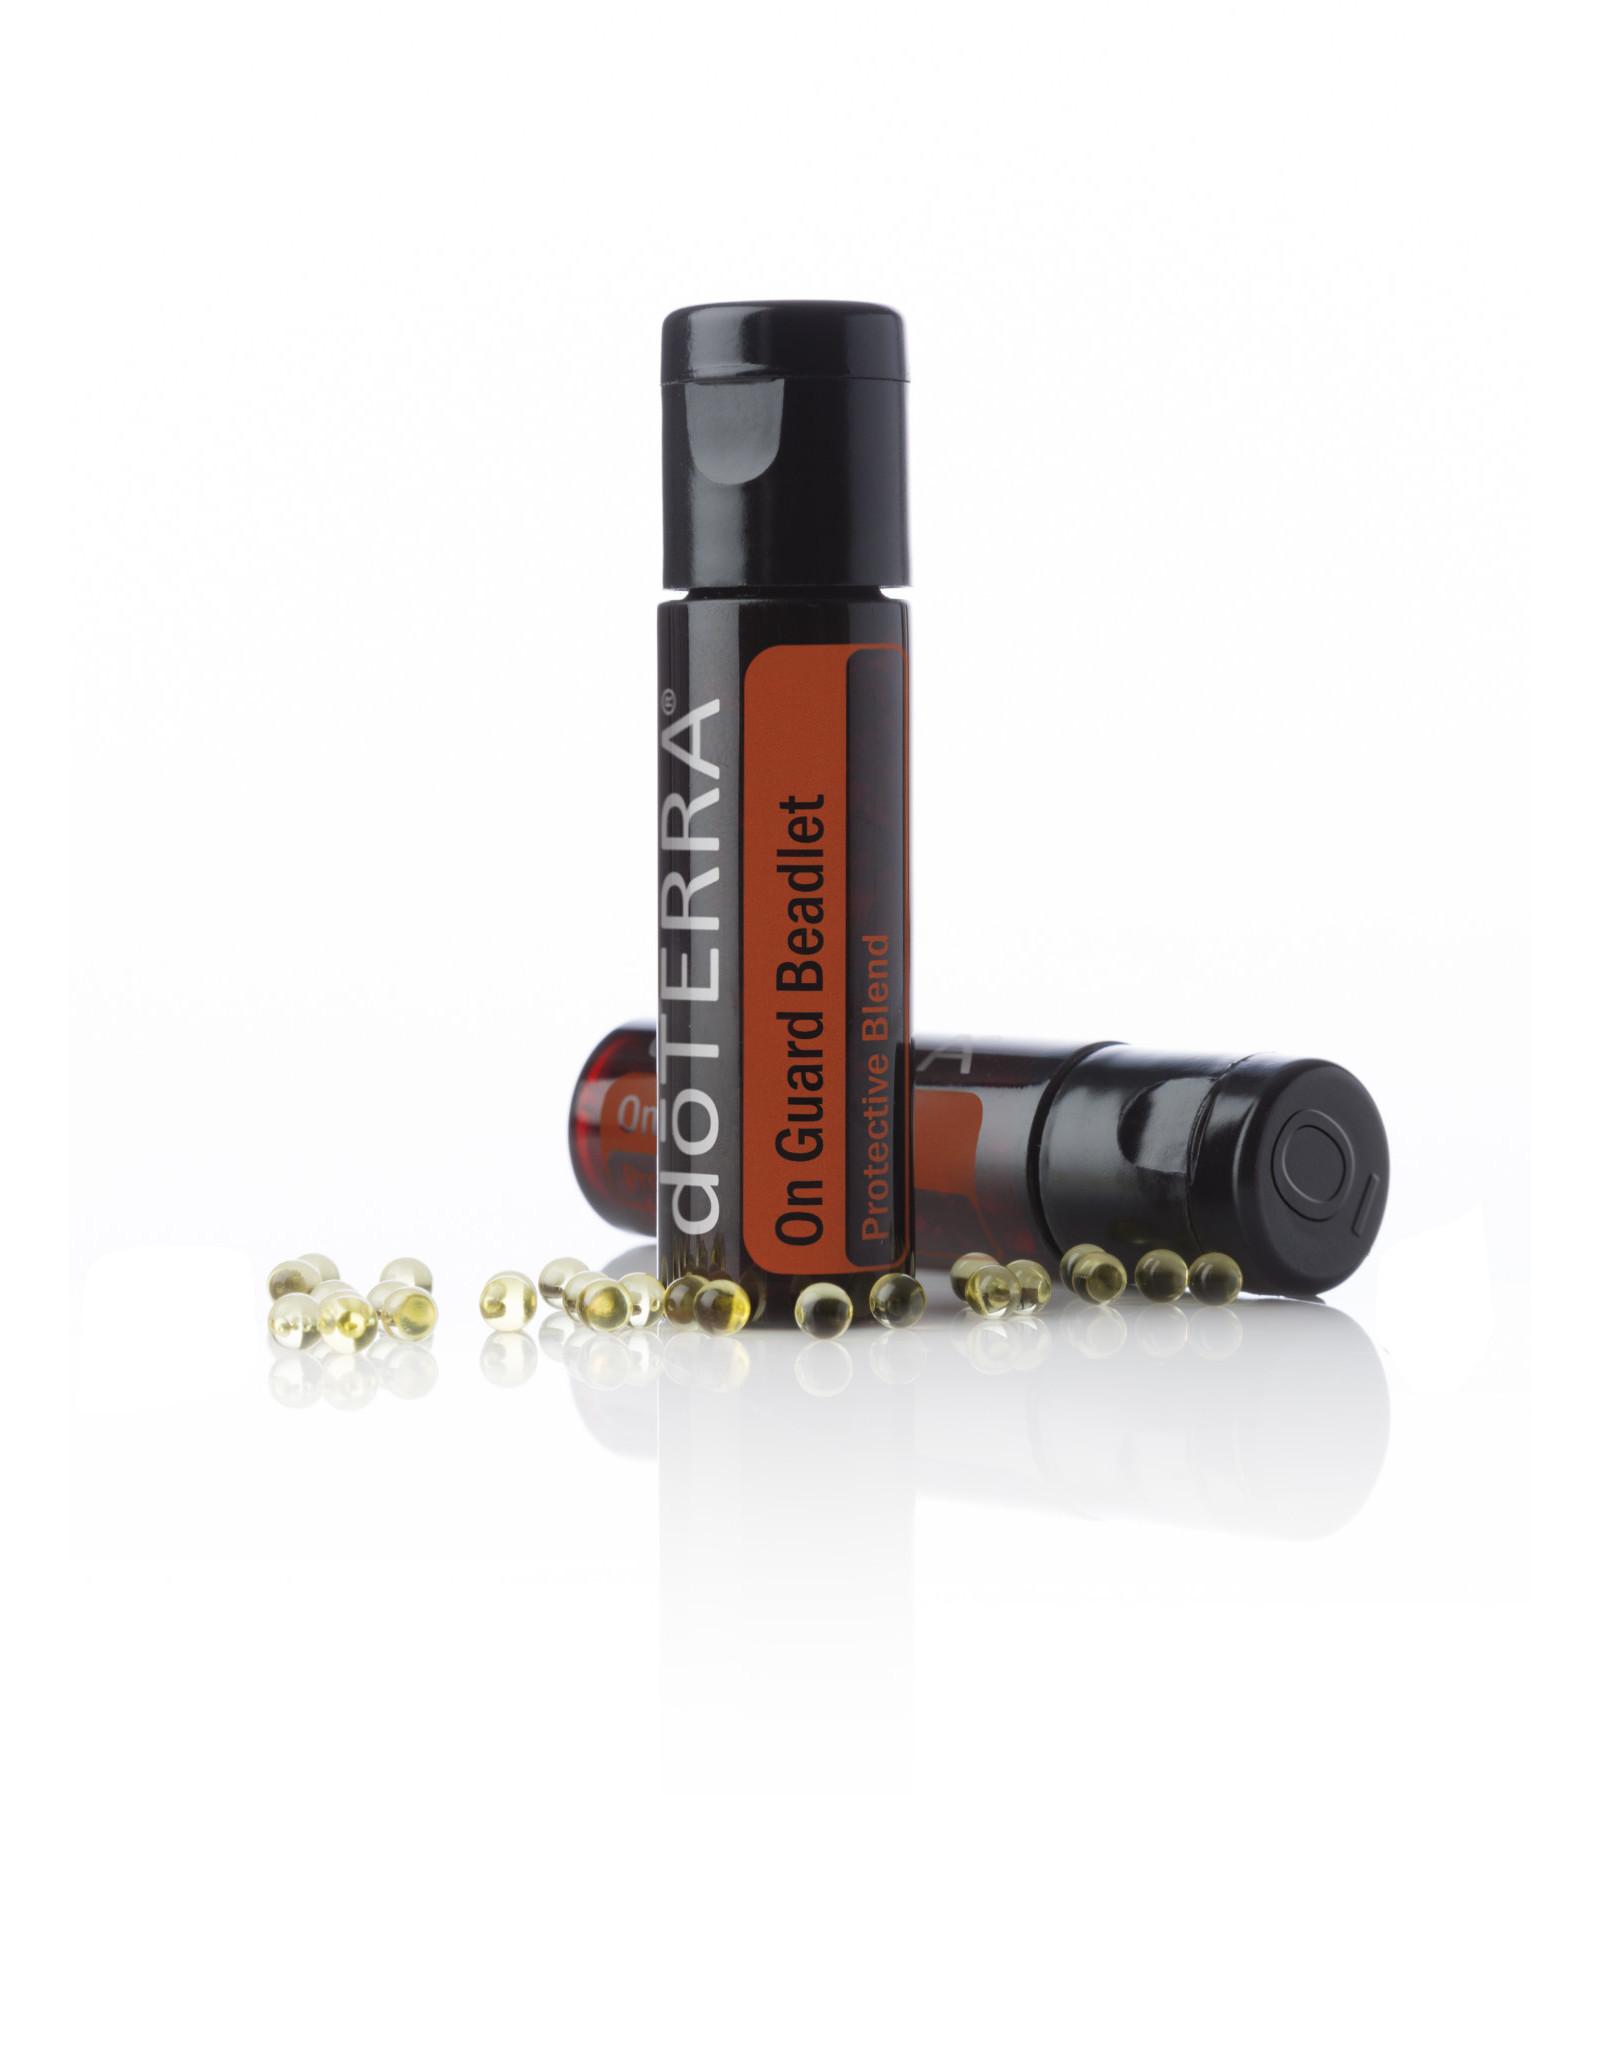 doTERRA doTERRA On Guard Beadlet Protective Blend (125 ct)